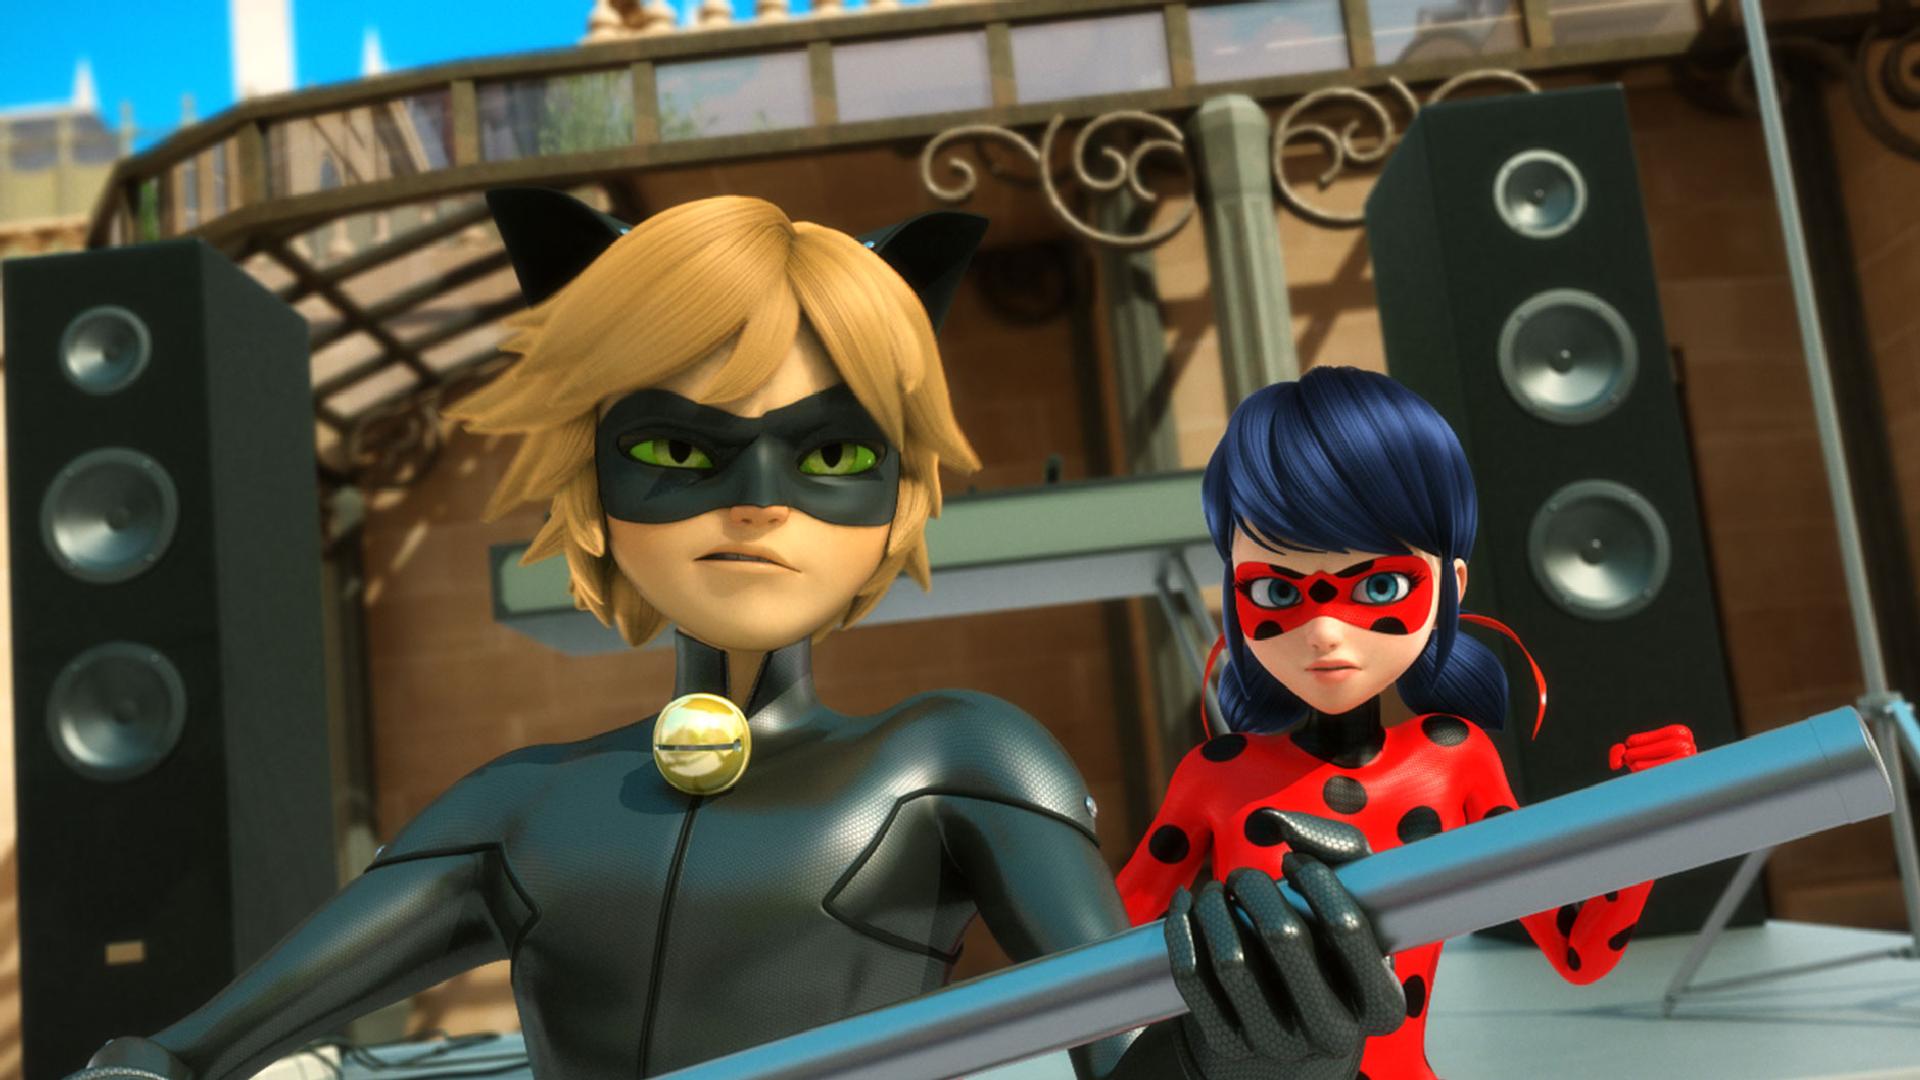 Miraculous Ladybug fondo de pantalla